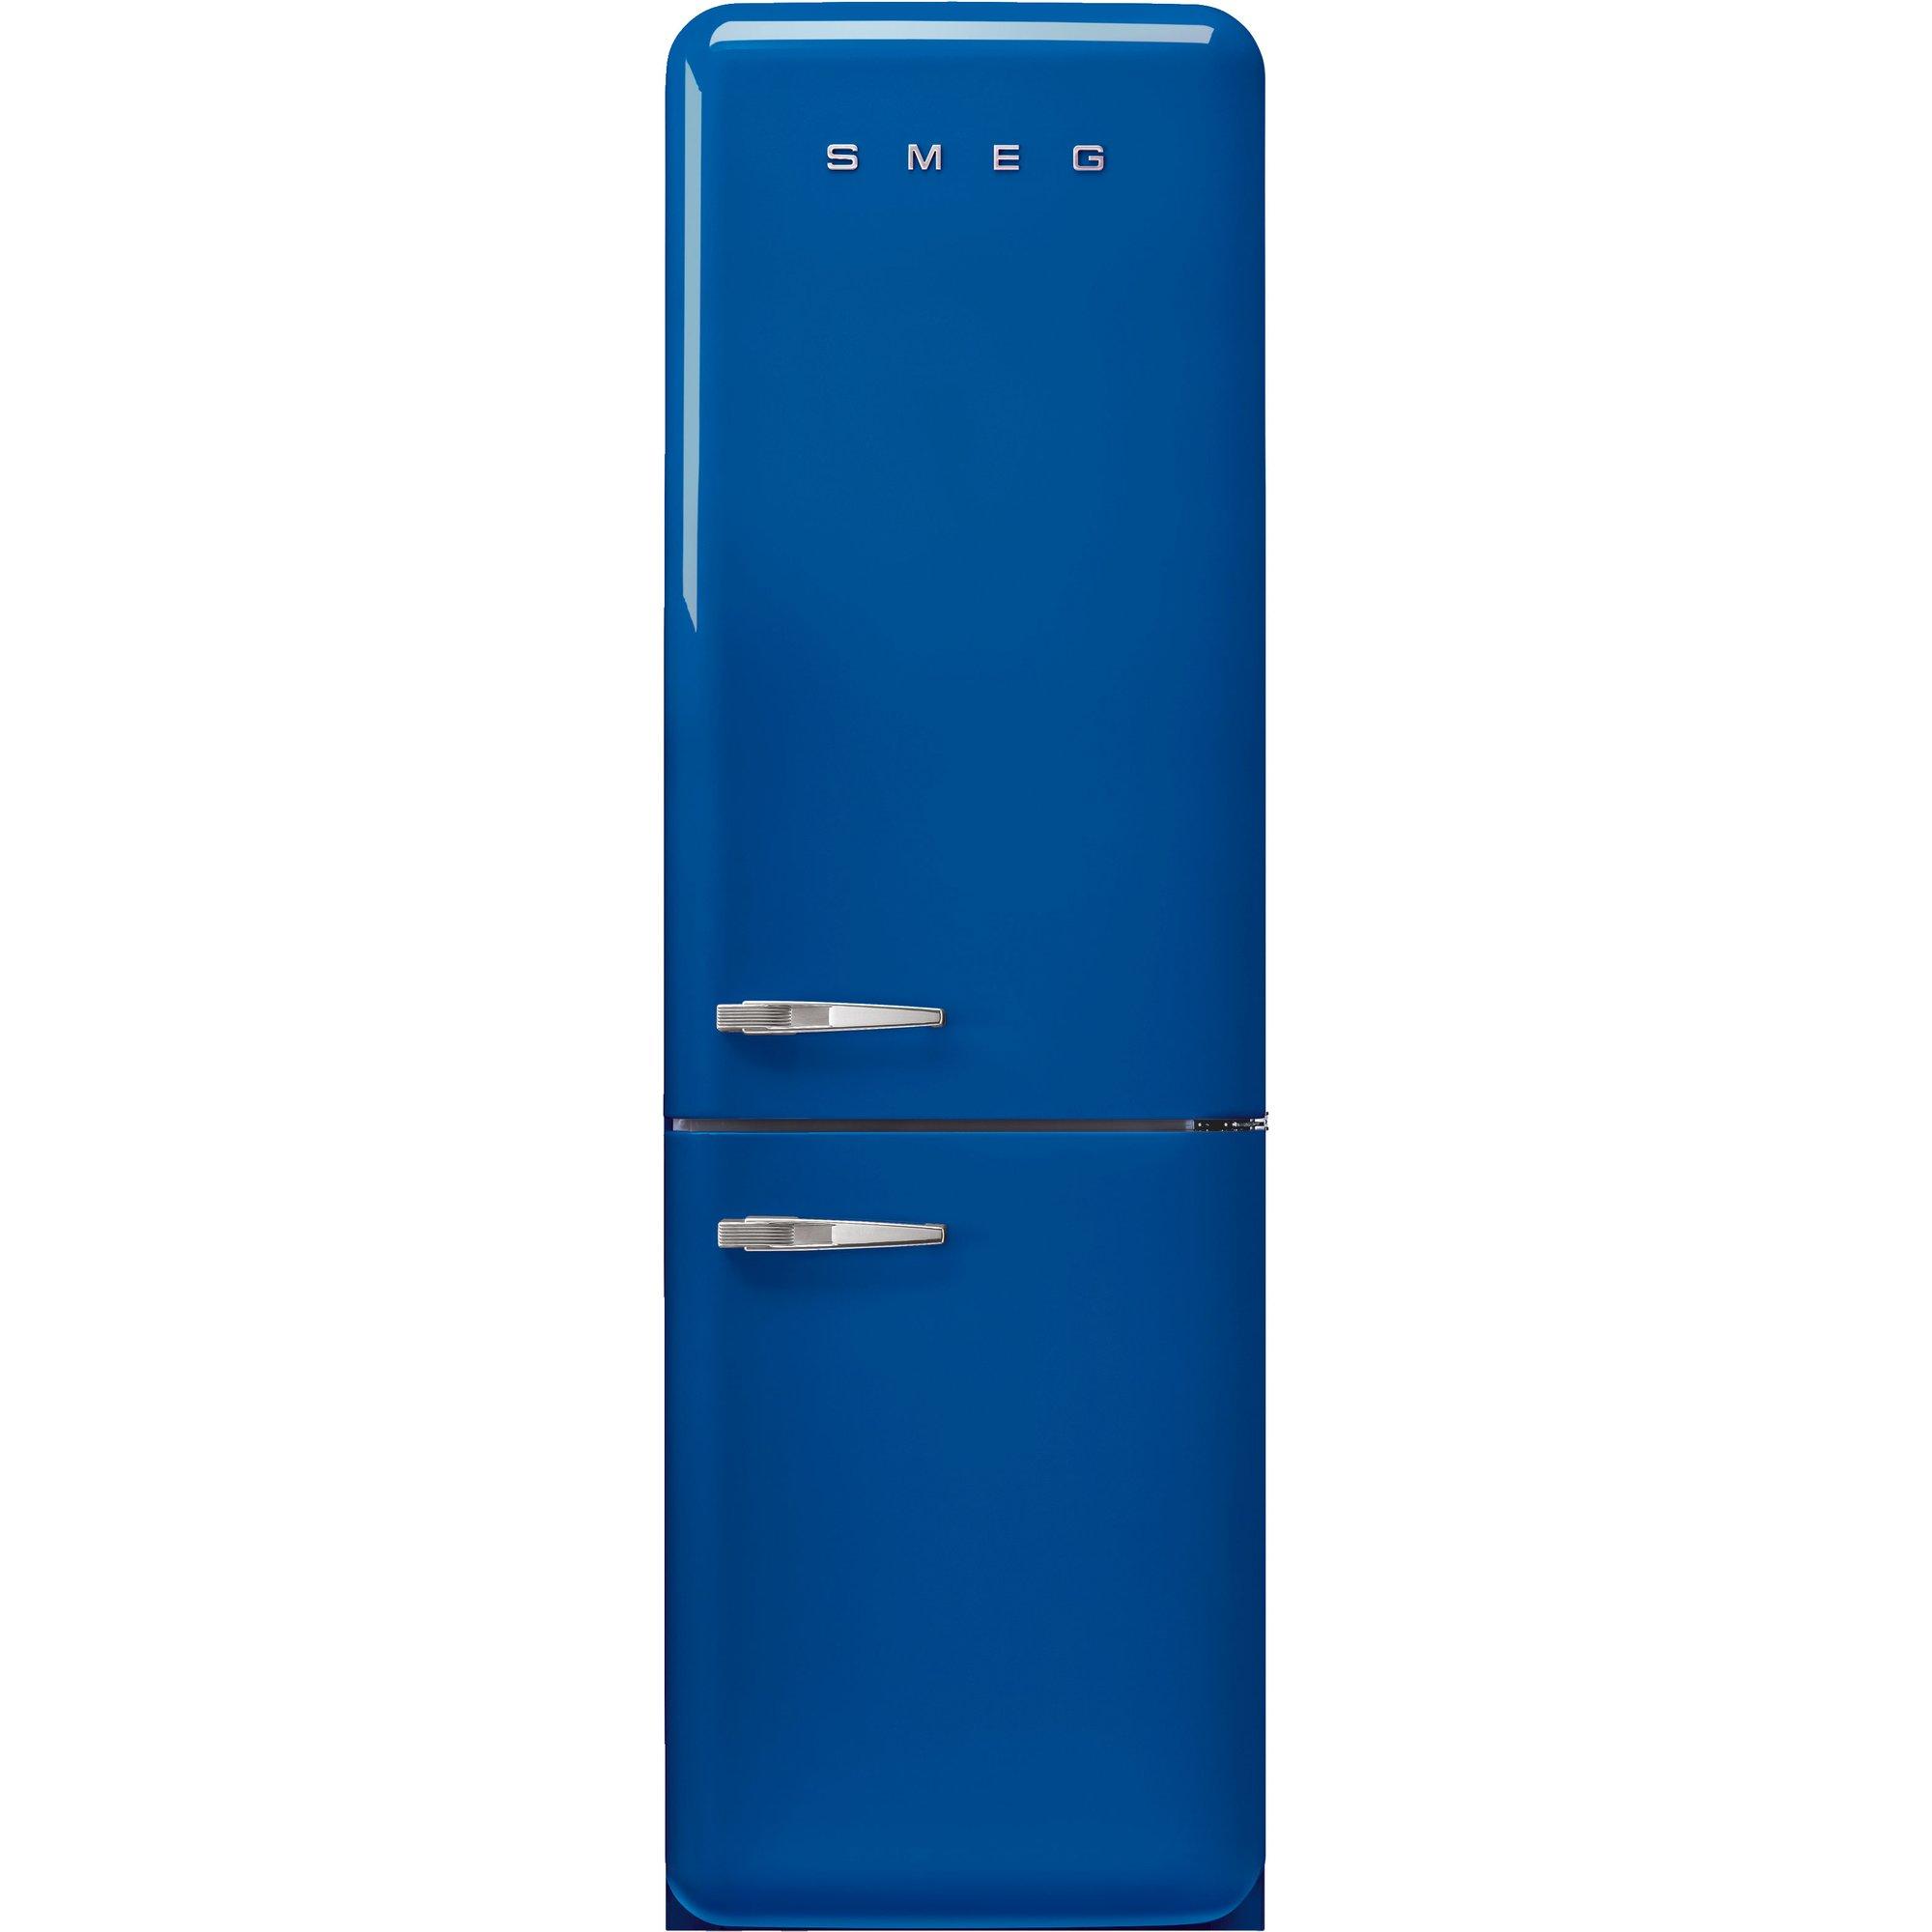 Smeg FAB32RBE5 Køle-/fryseskab blå